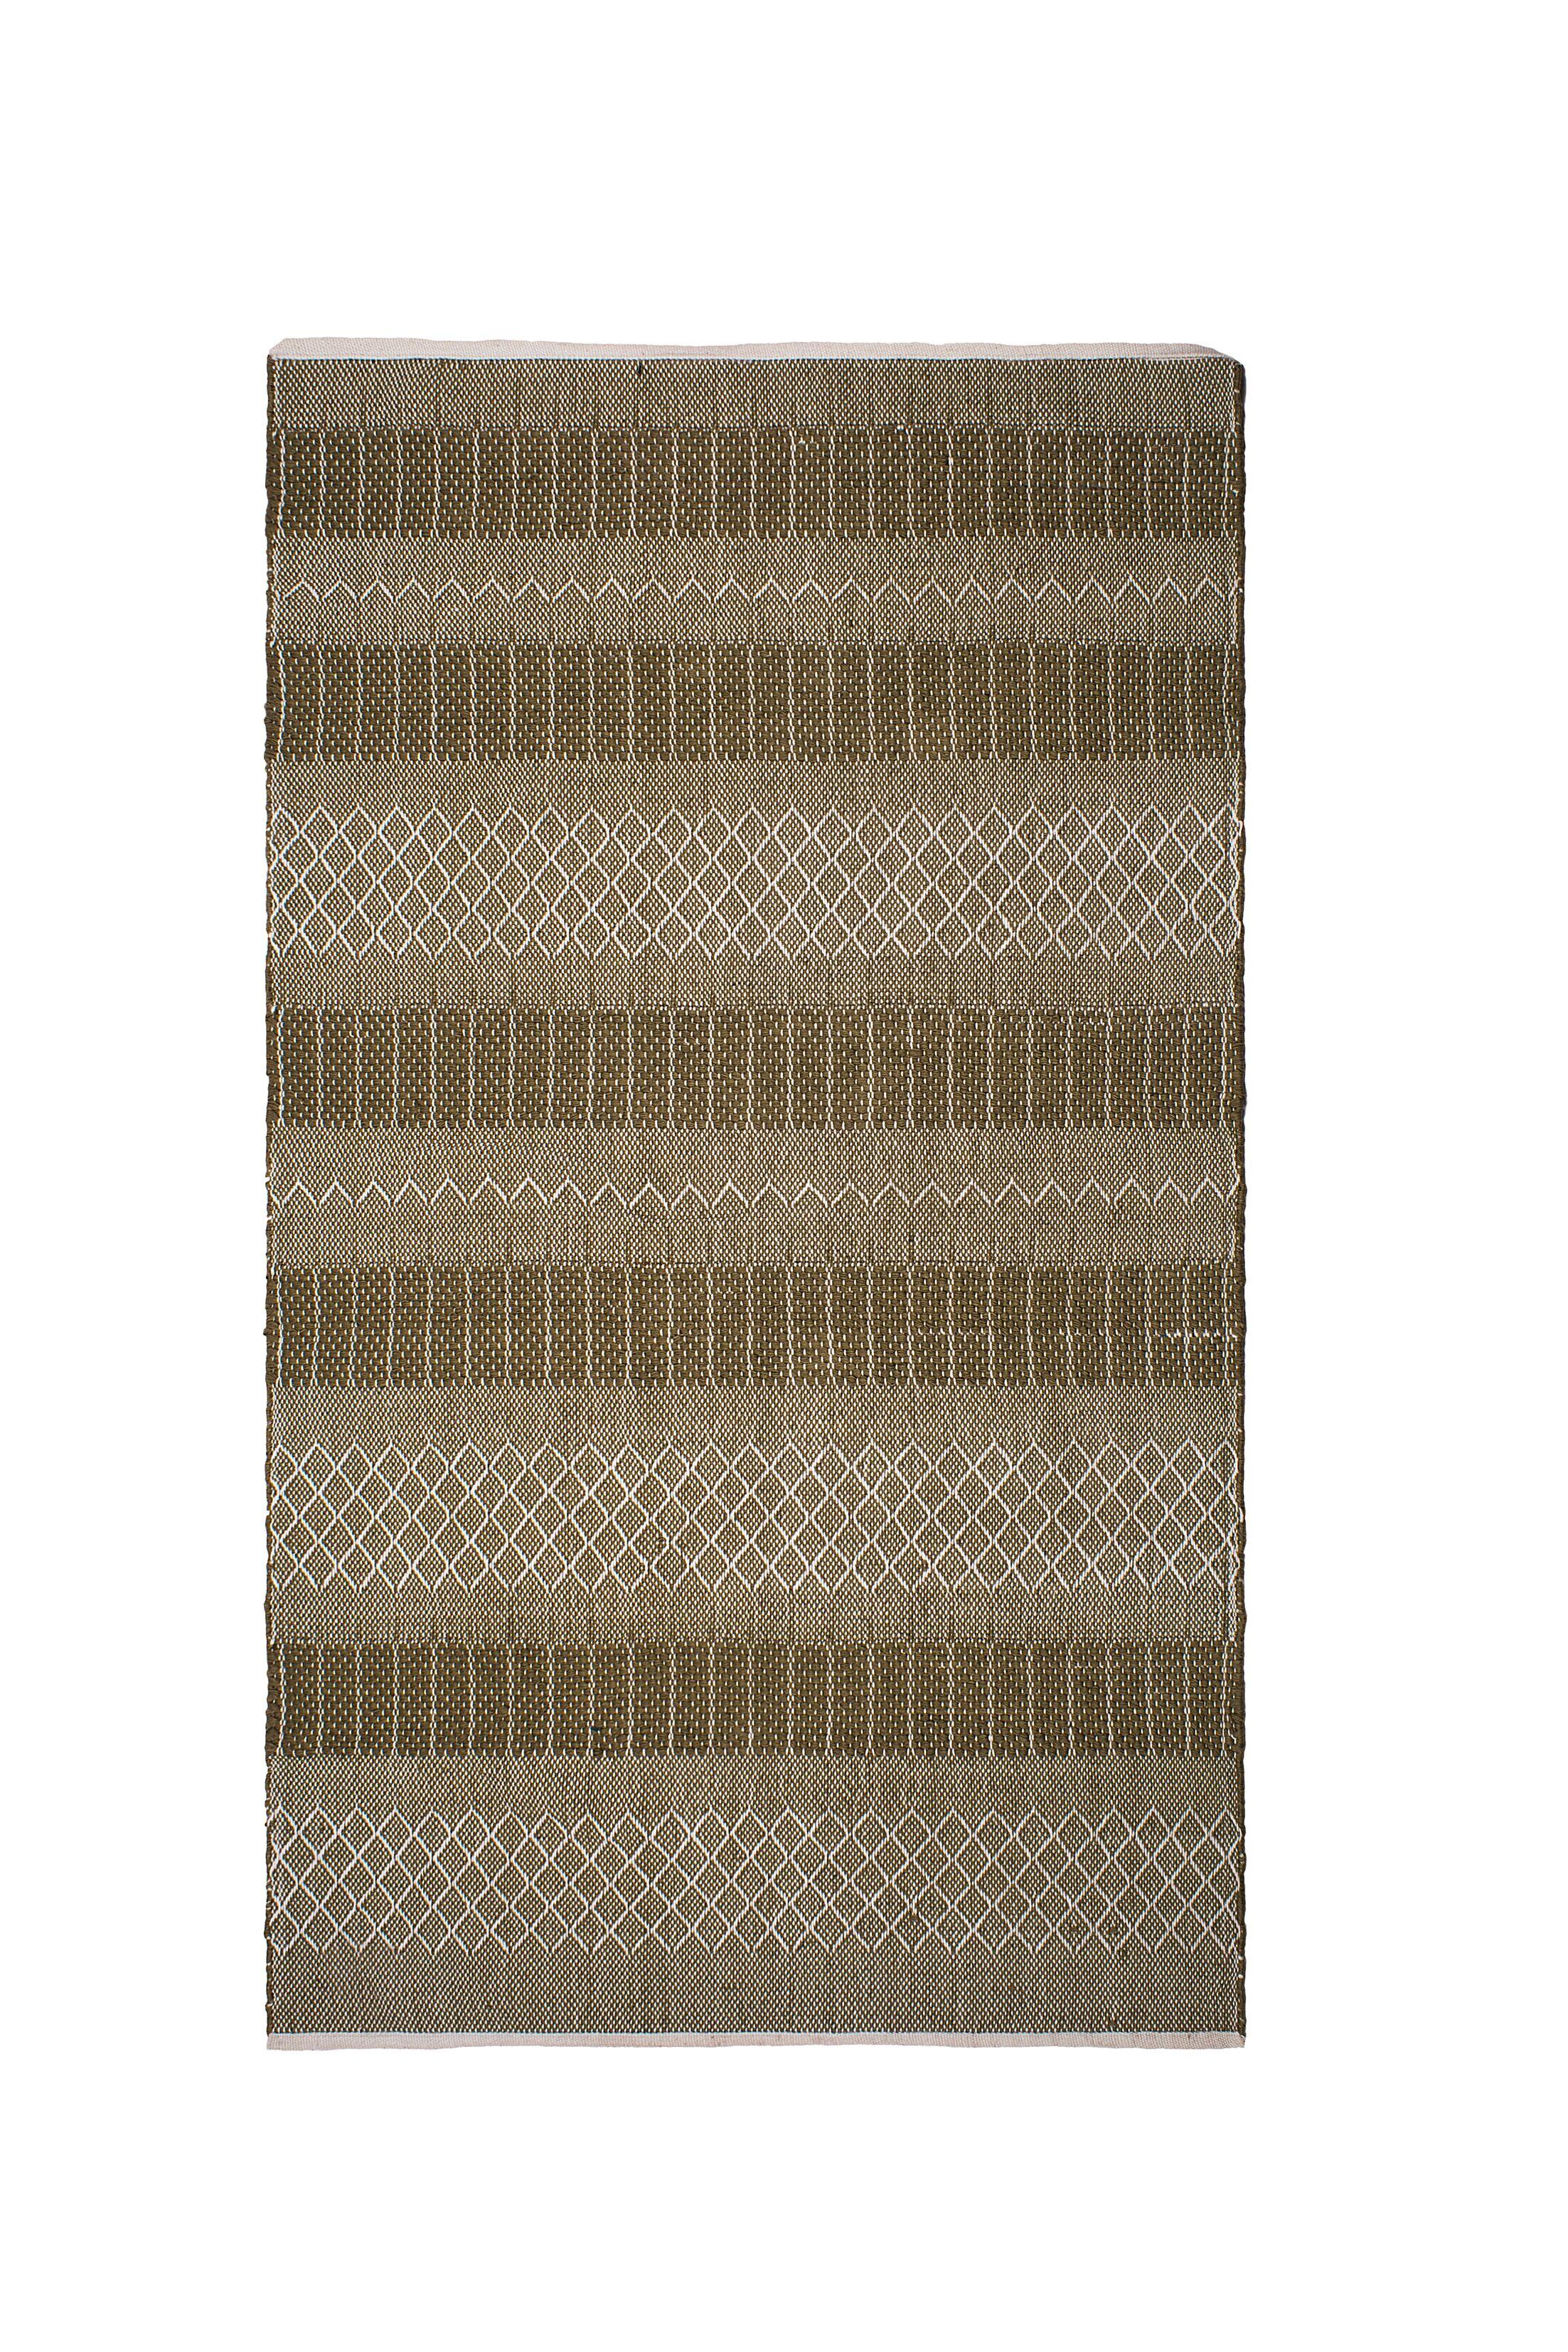 Marciano Hand-Woven Green Indoor/Outdoor Area Rug Rug Size: Rectangle 3' x 5'